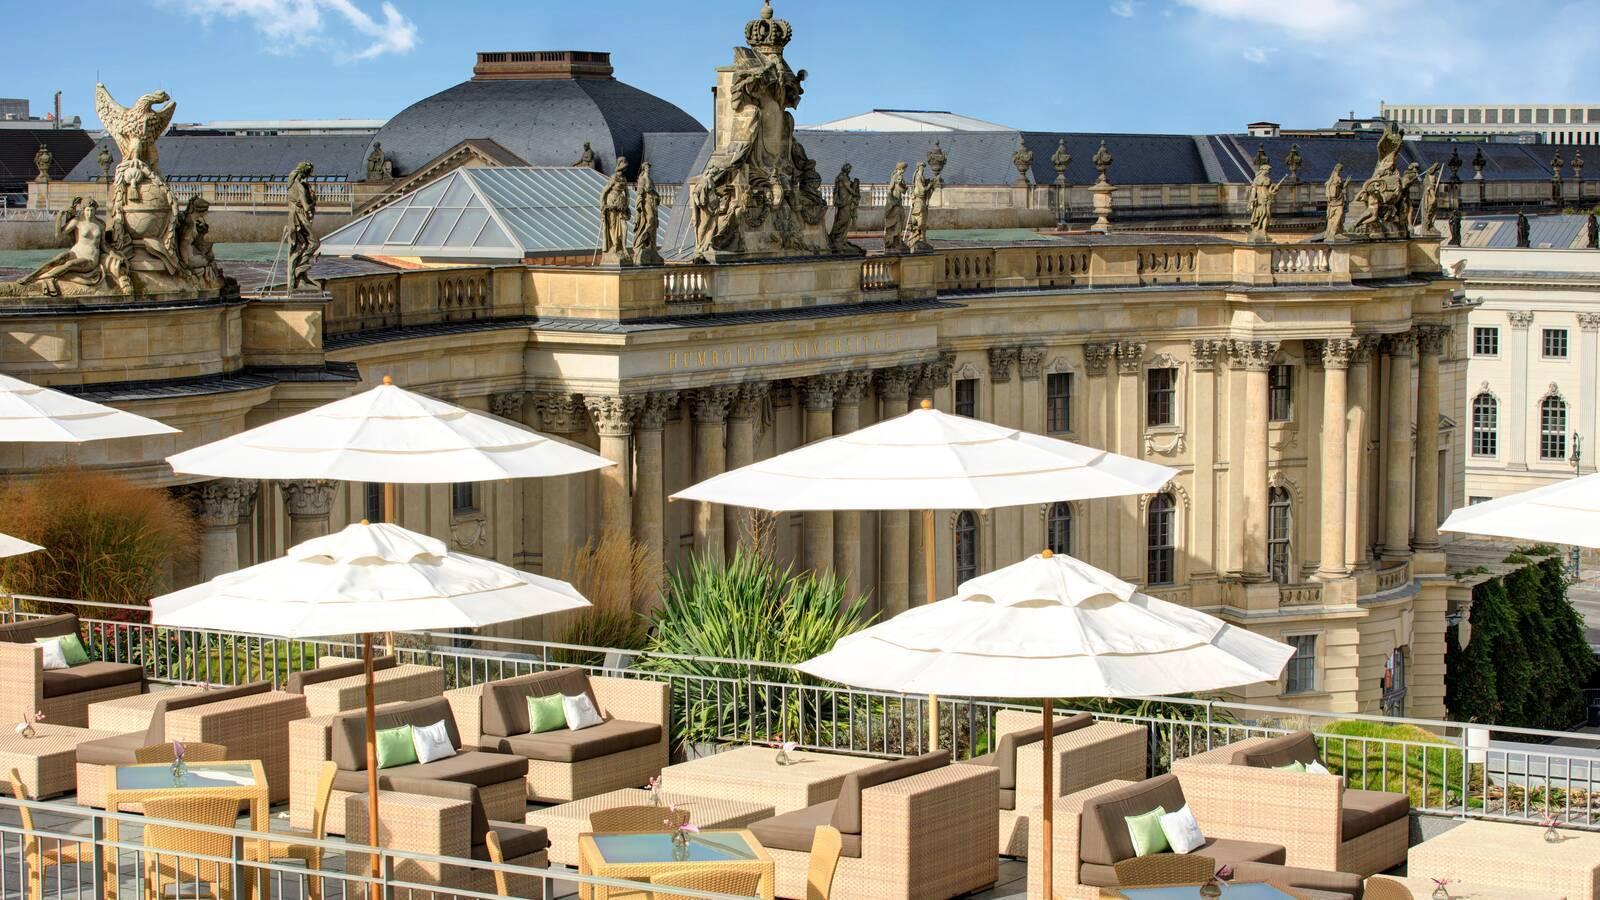 Hotel de Rome Berlin Rocco Forte Terrasse